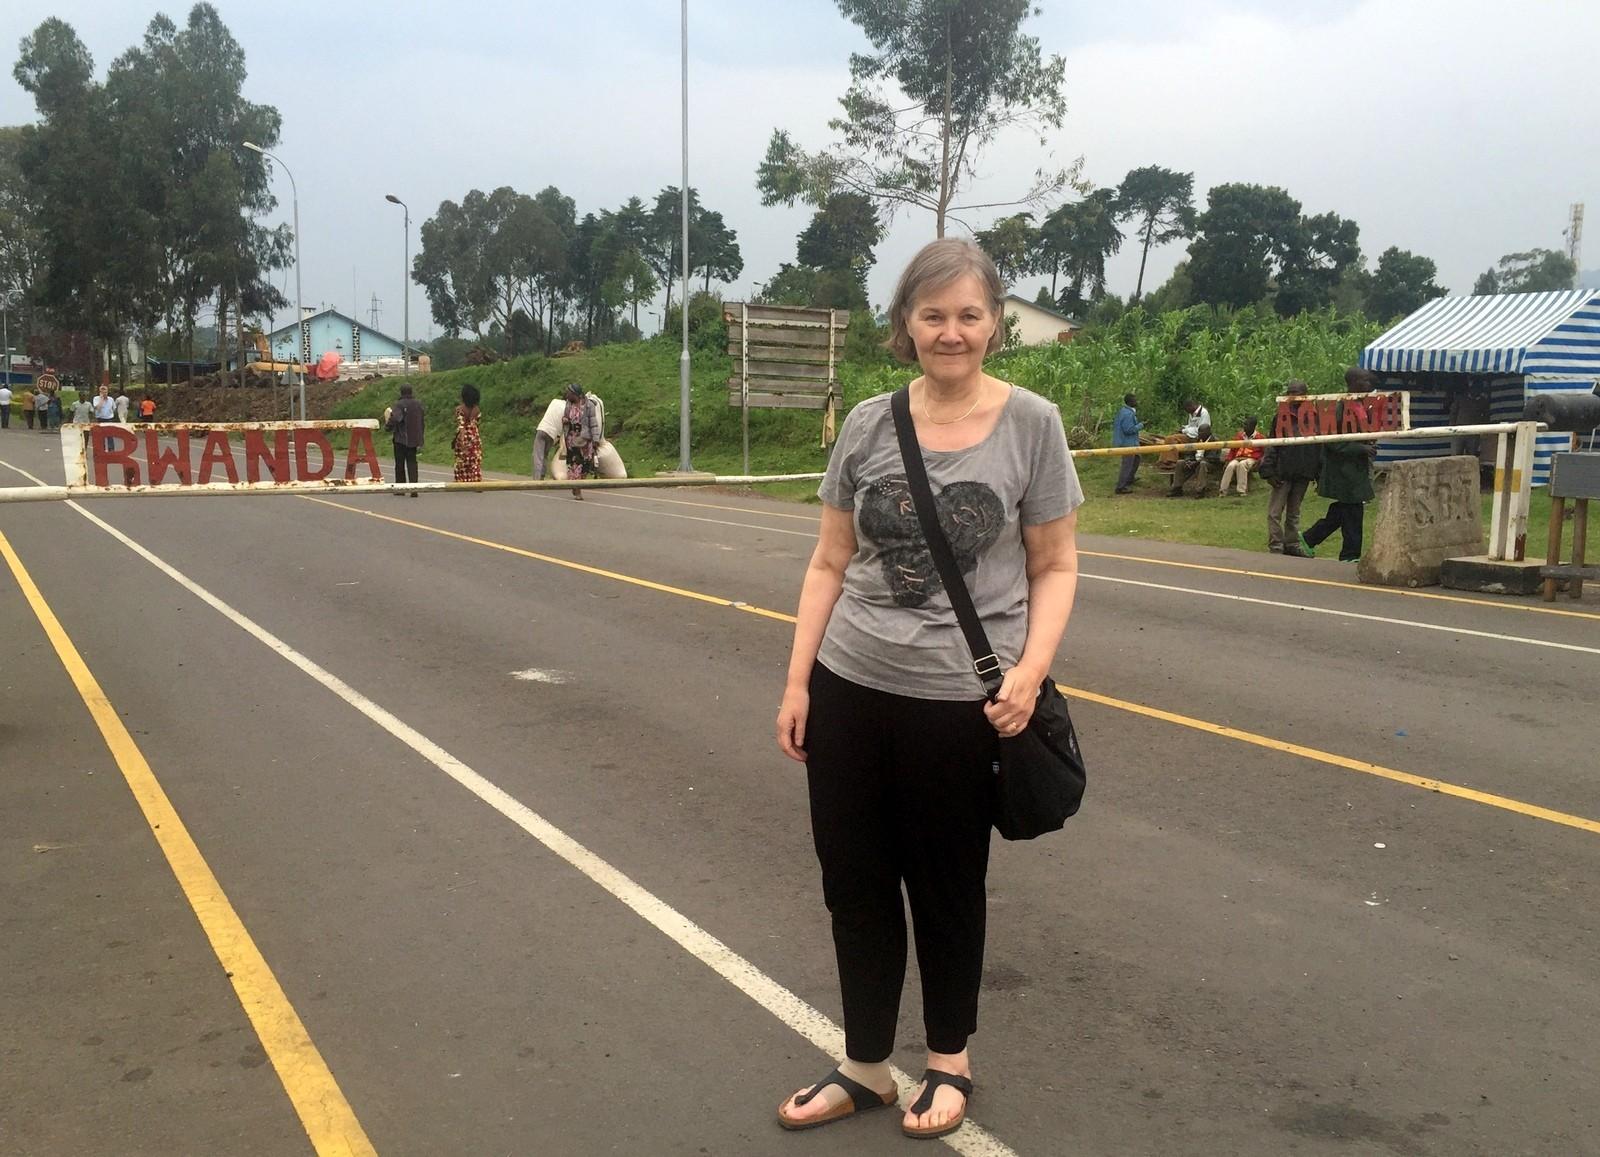 Ruandan ja Ugandan rajalla